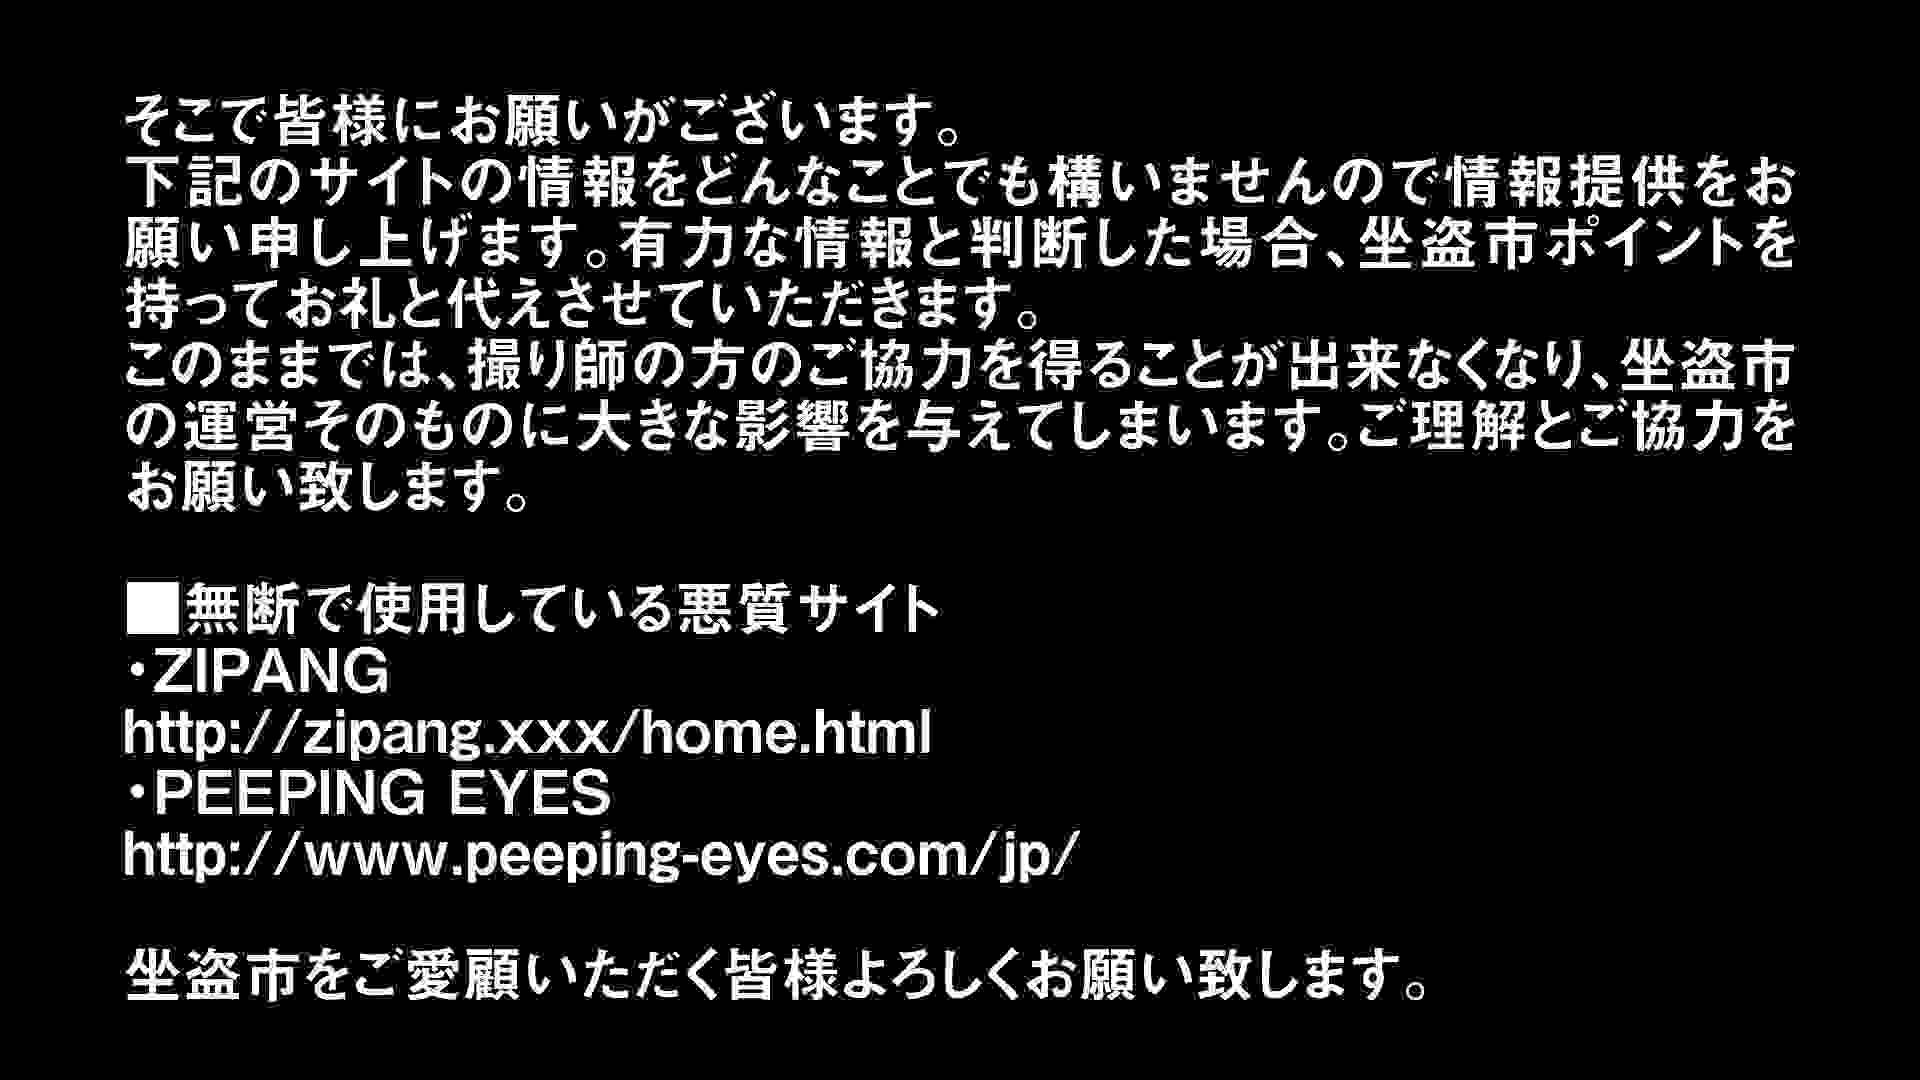 Aquaな露天風呂Vol.300 盗撮シリーズ | 露天風呂編  110PIX 43